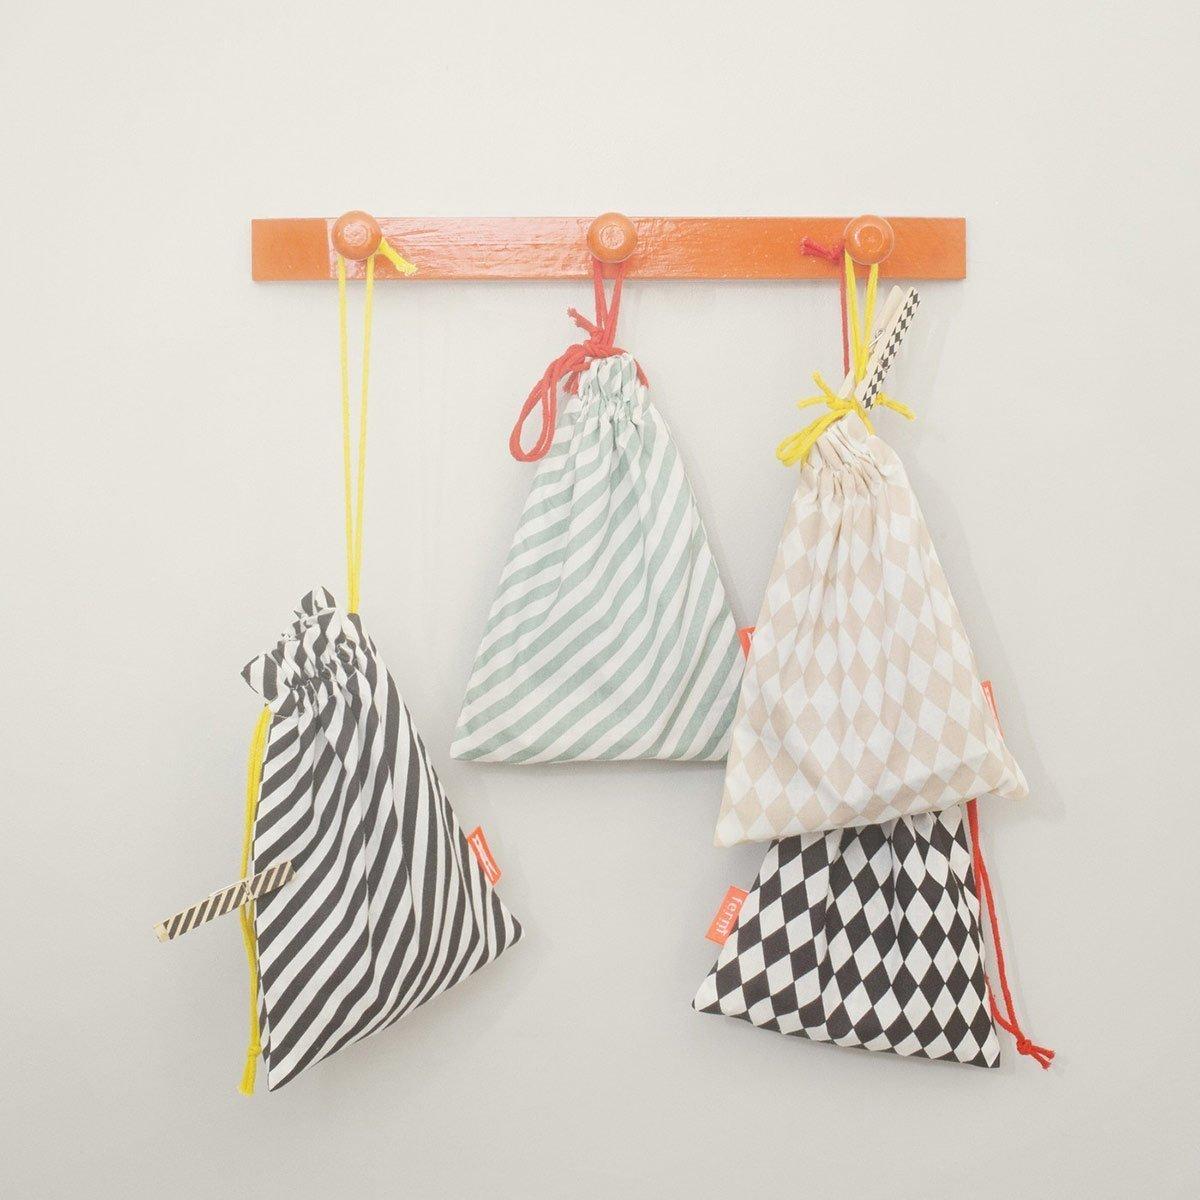 Ferm Living Striped Clothes Pins, Blue Bag (Witn 20 Pins)